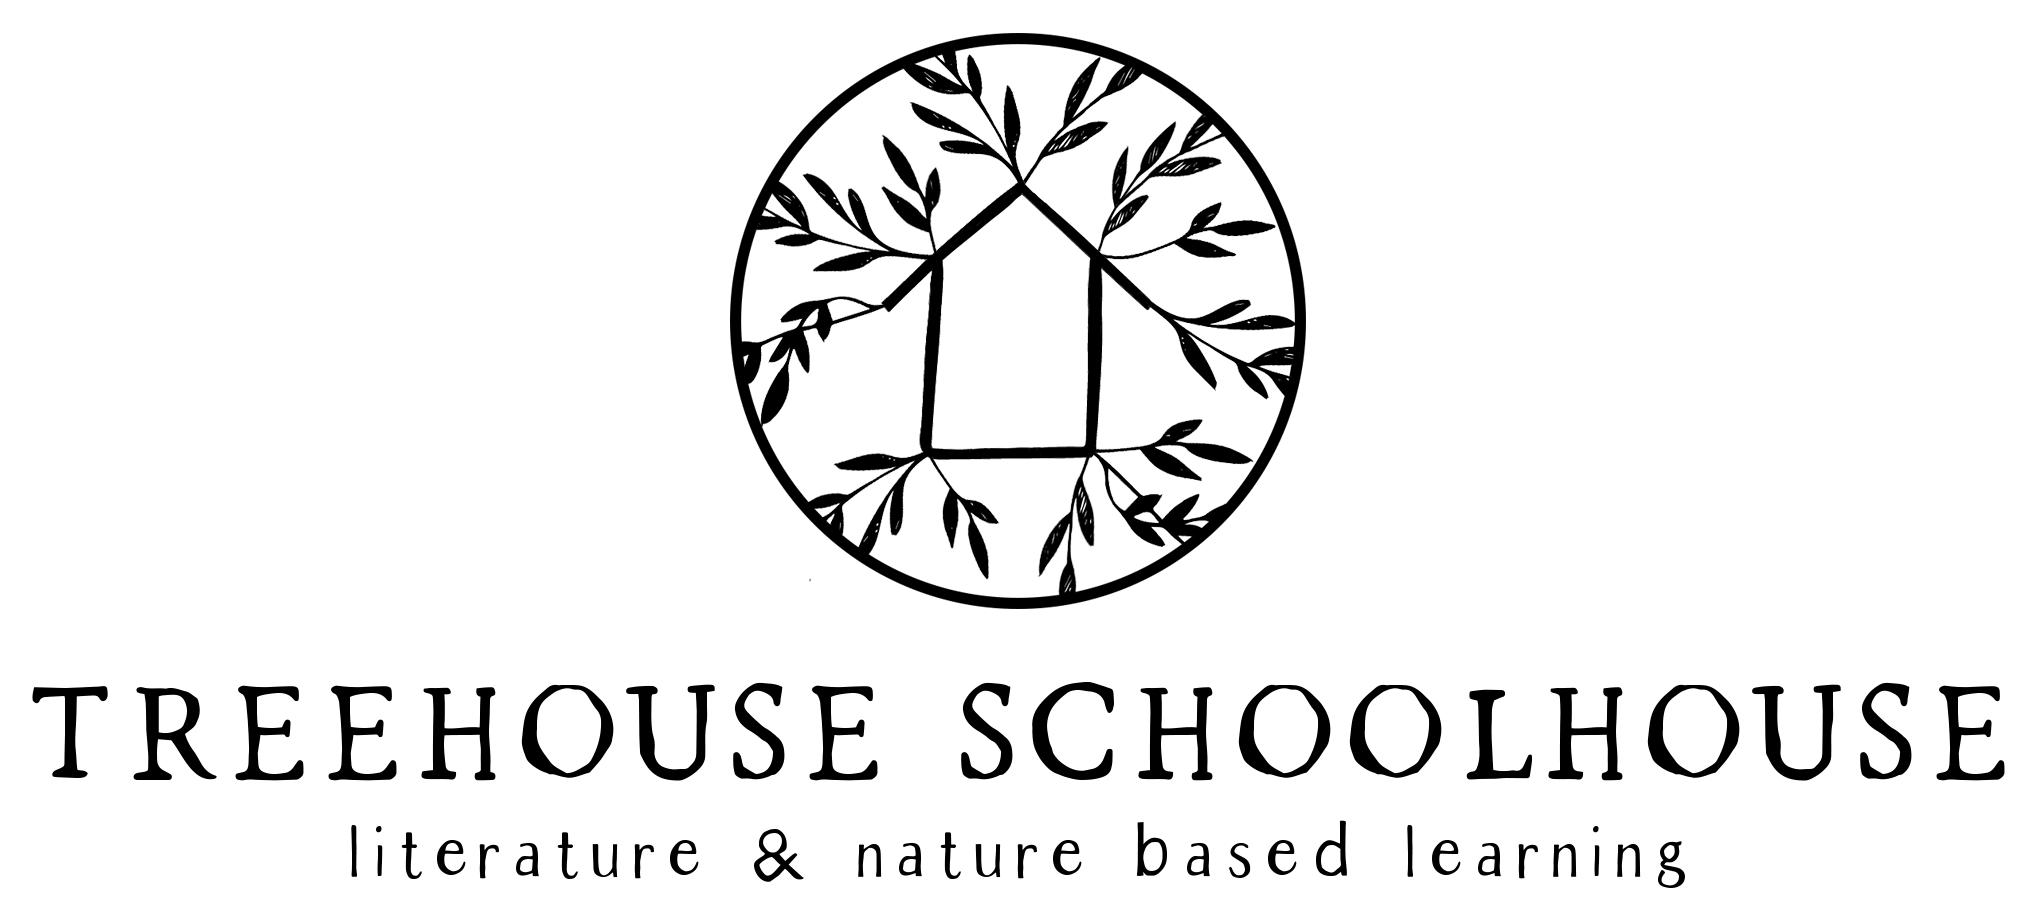 Treehouse Schoolhouse